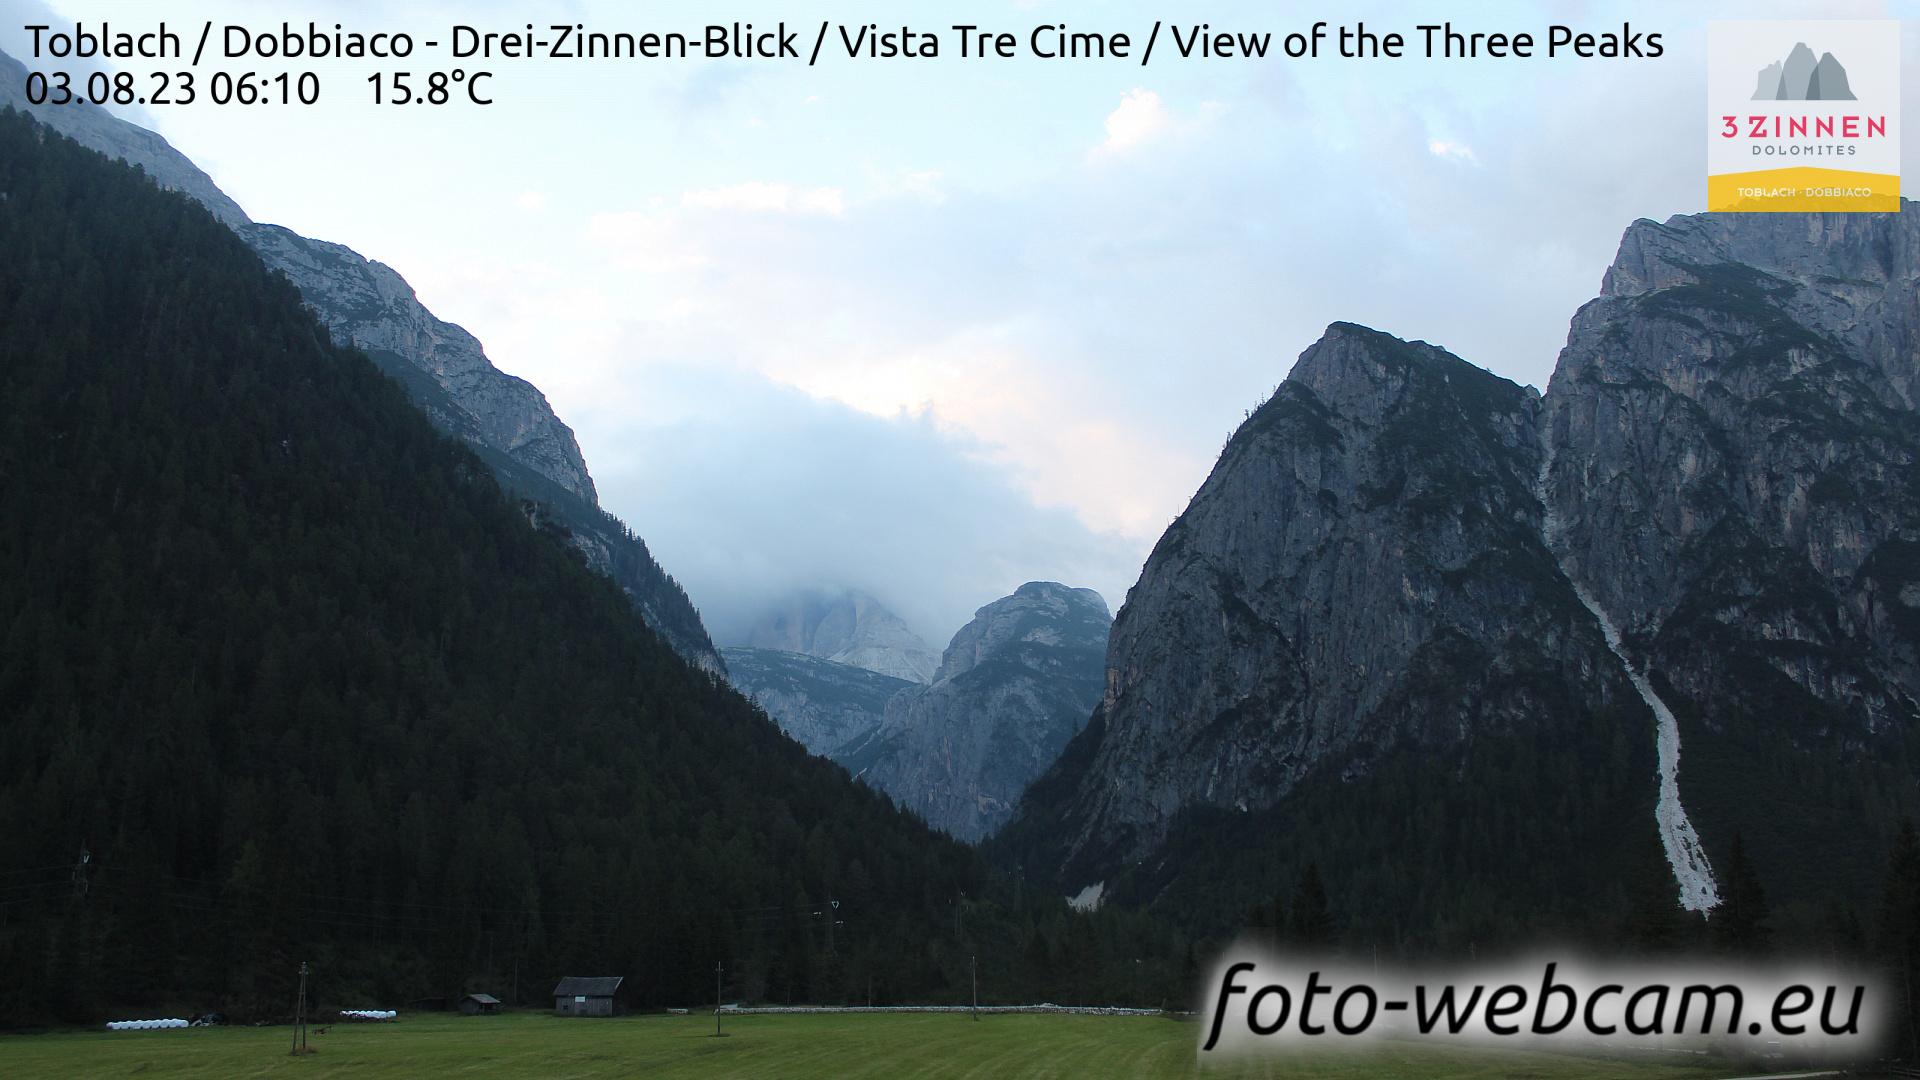 Toblach (Dolomiten) Do. 06:27